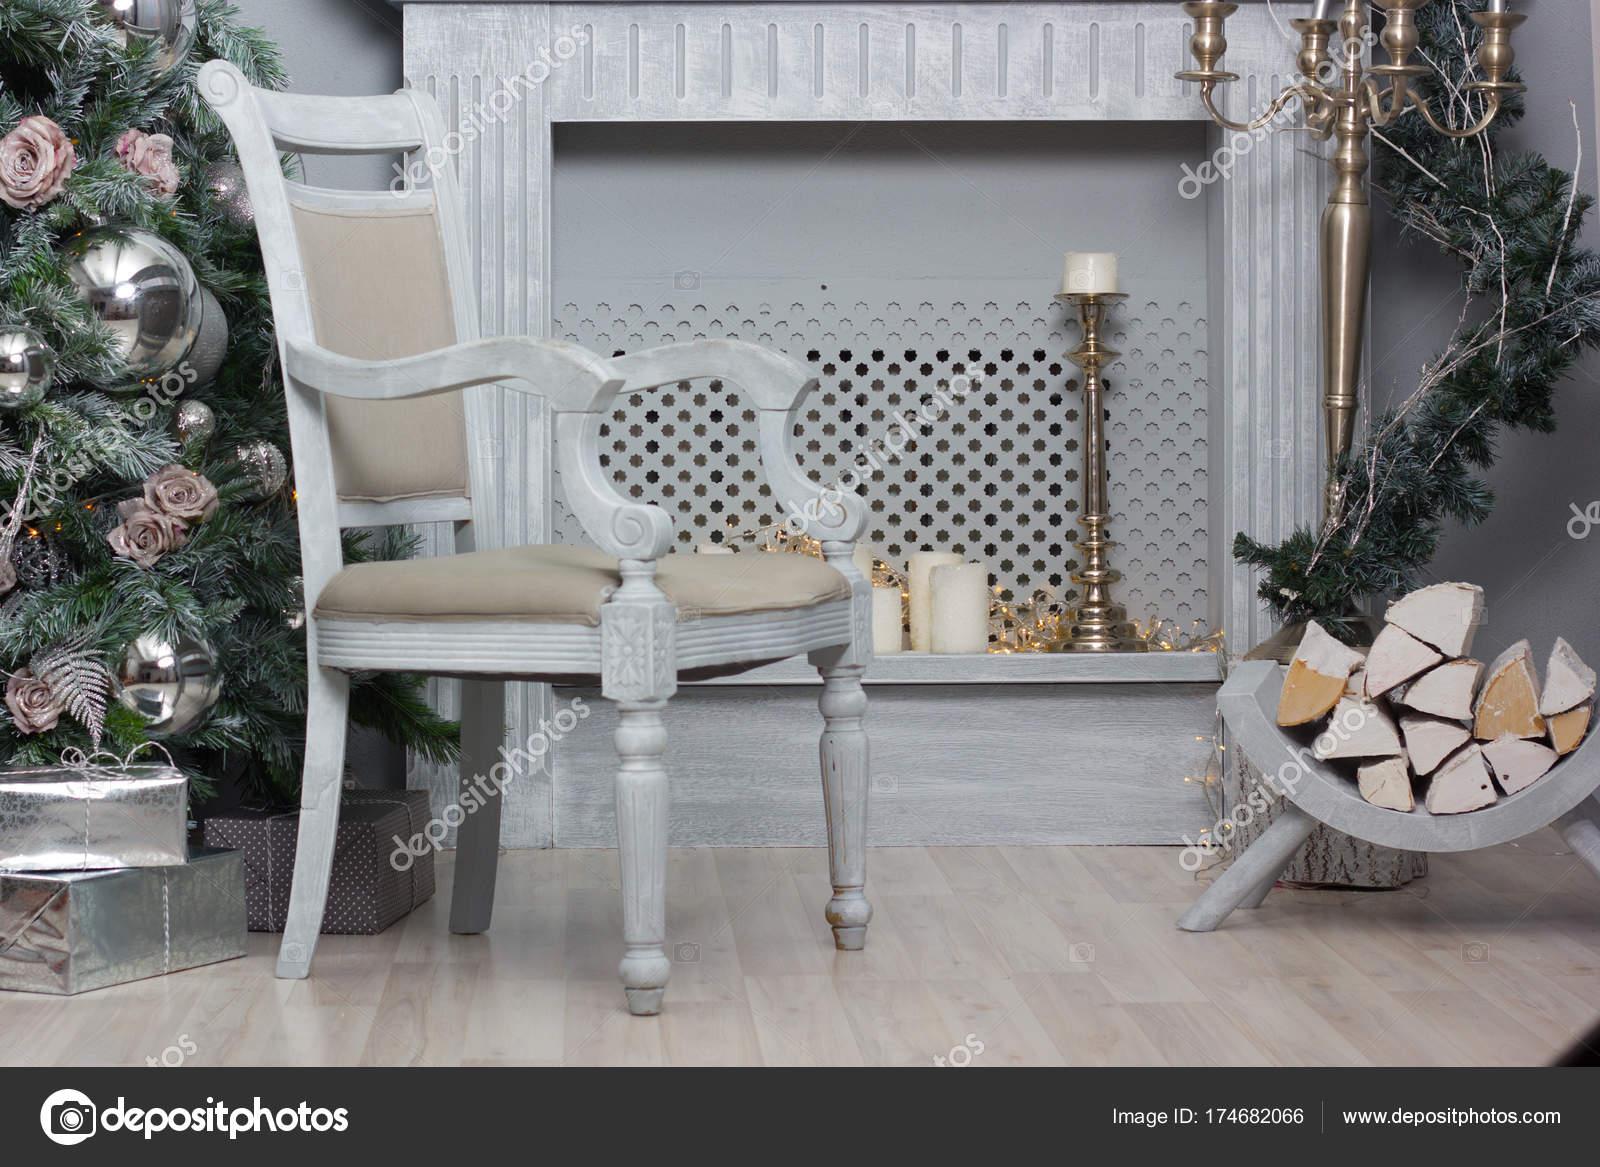 Interieur Du Salon Avec Cheminee Photographie Sharafmaksumov C 174682066